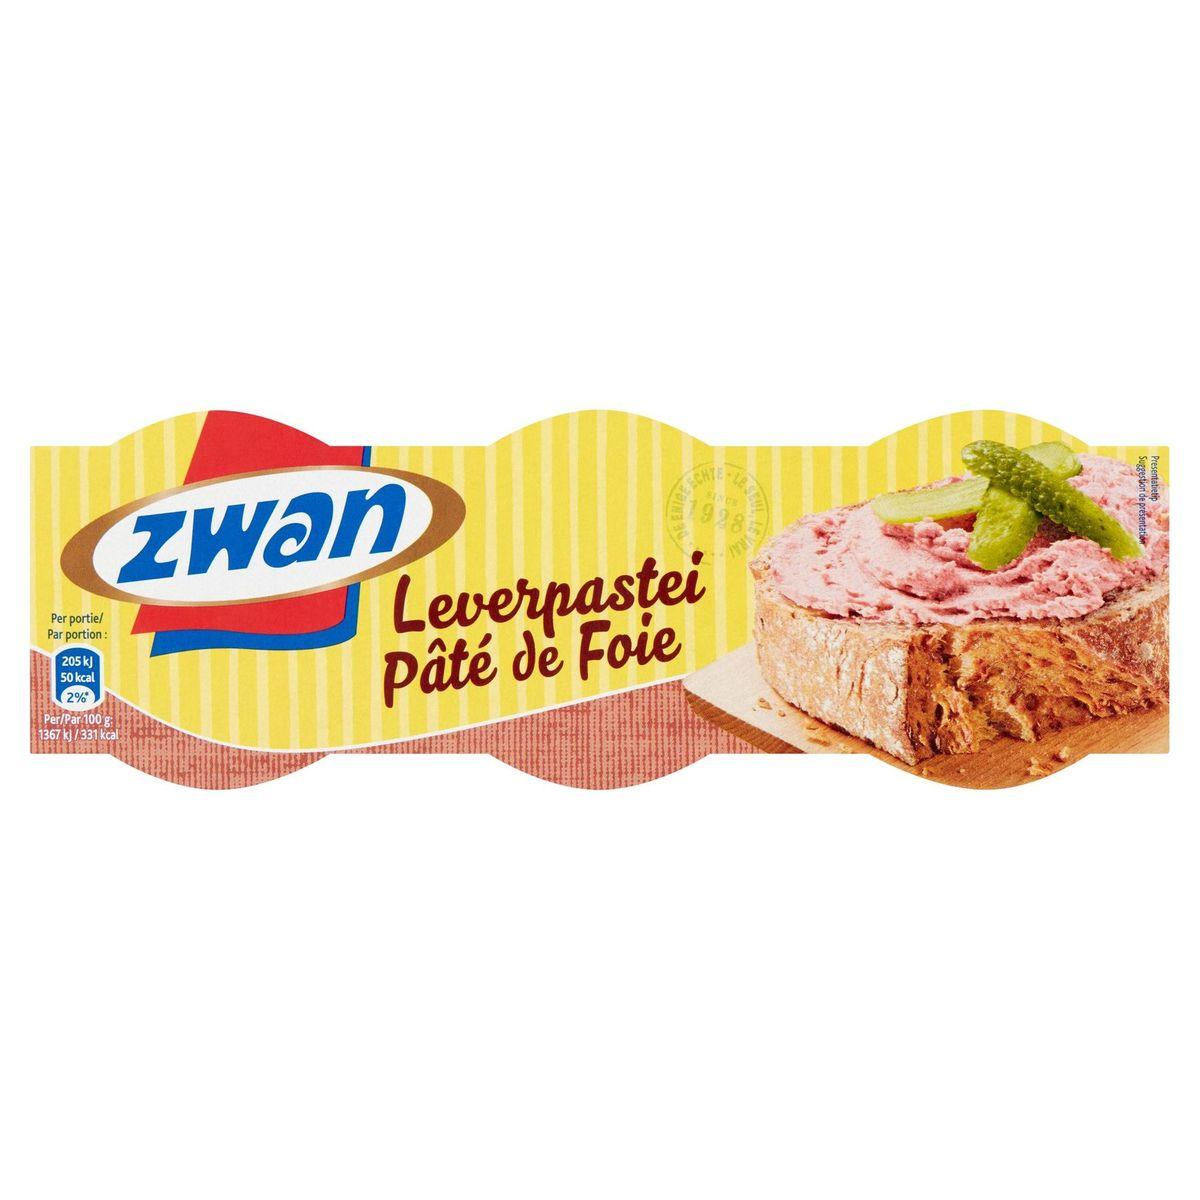 Zwan Pâté de Foie 3 x 43 g